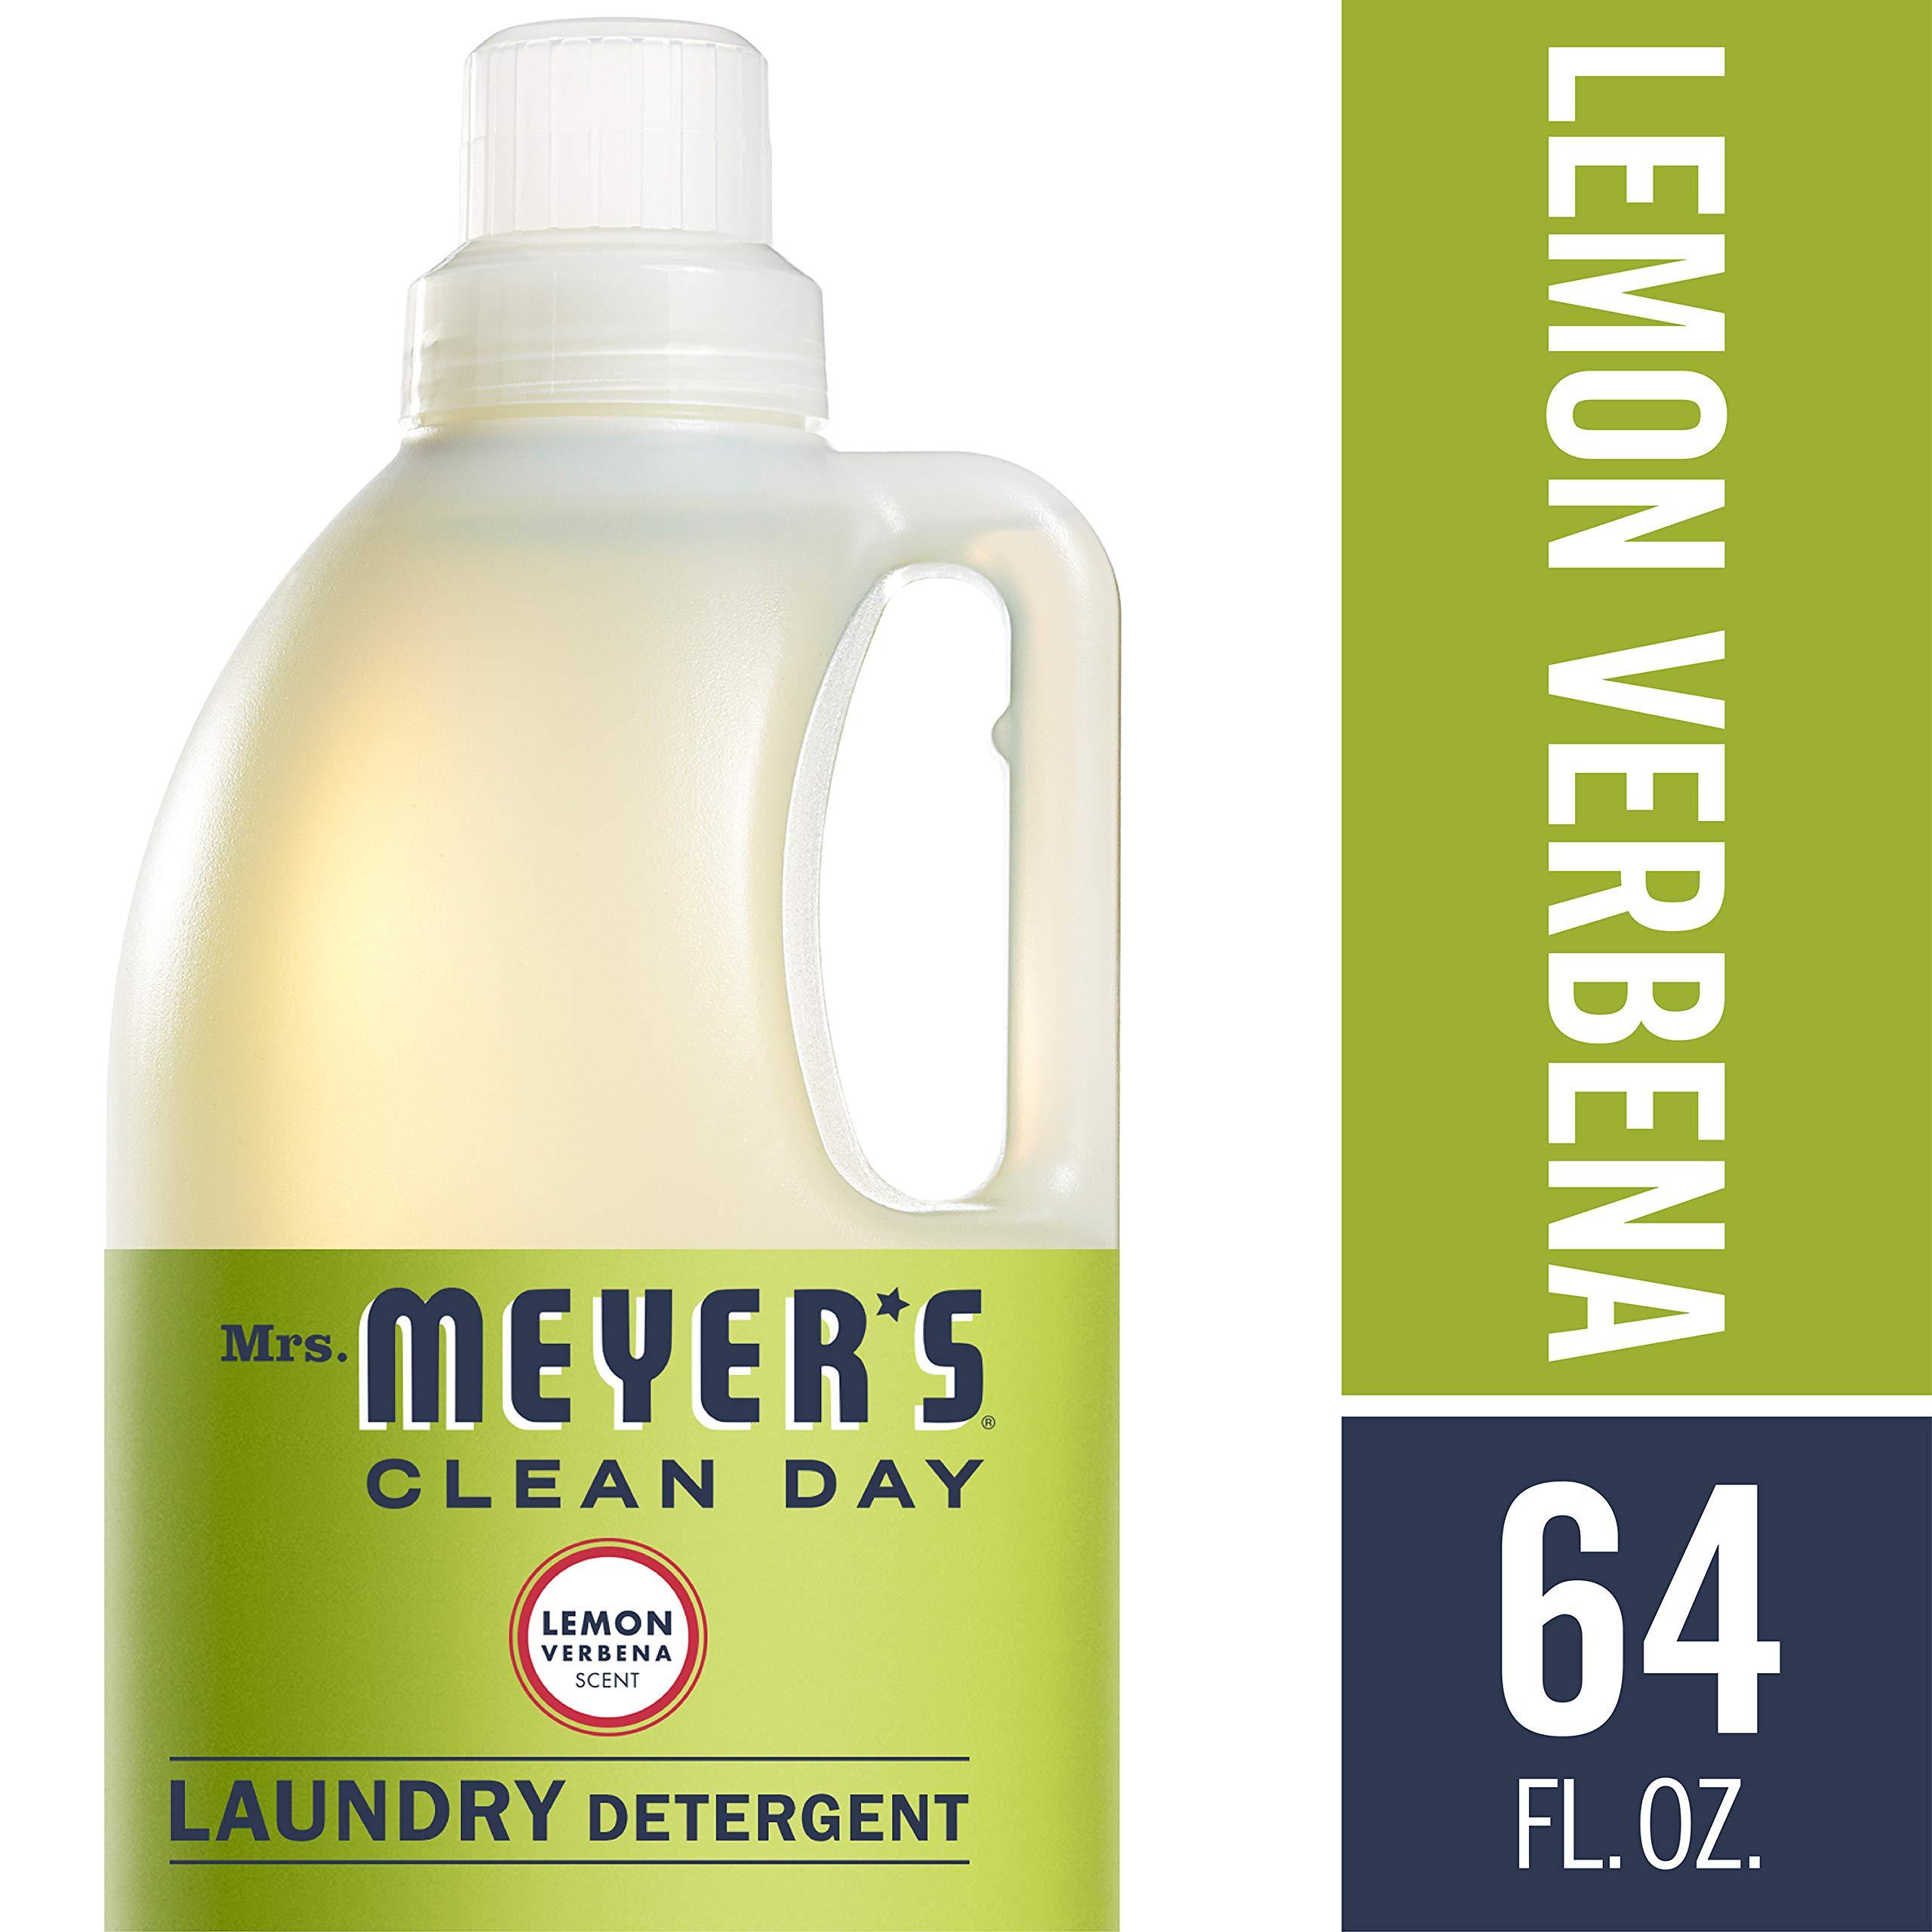 Mrs. Meyer's Laundry Detergent, Lemon Verbena, 64 fl oz